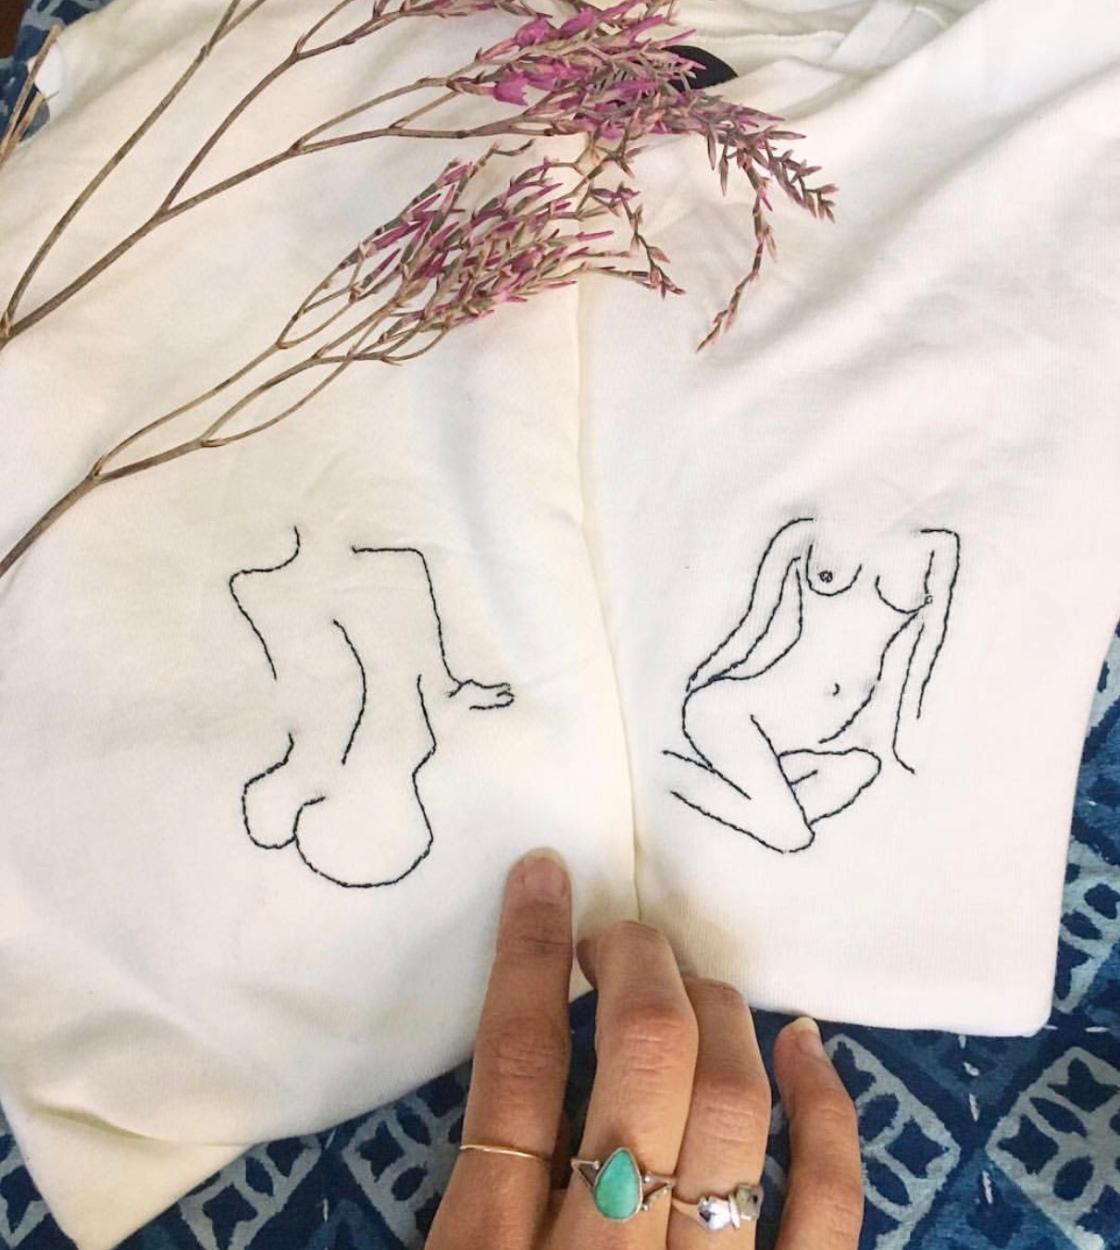 Embroidery body positivity